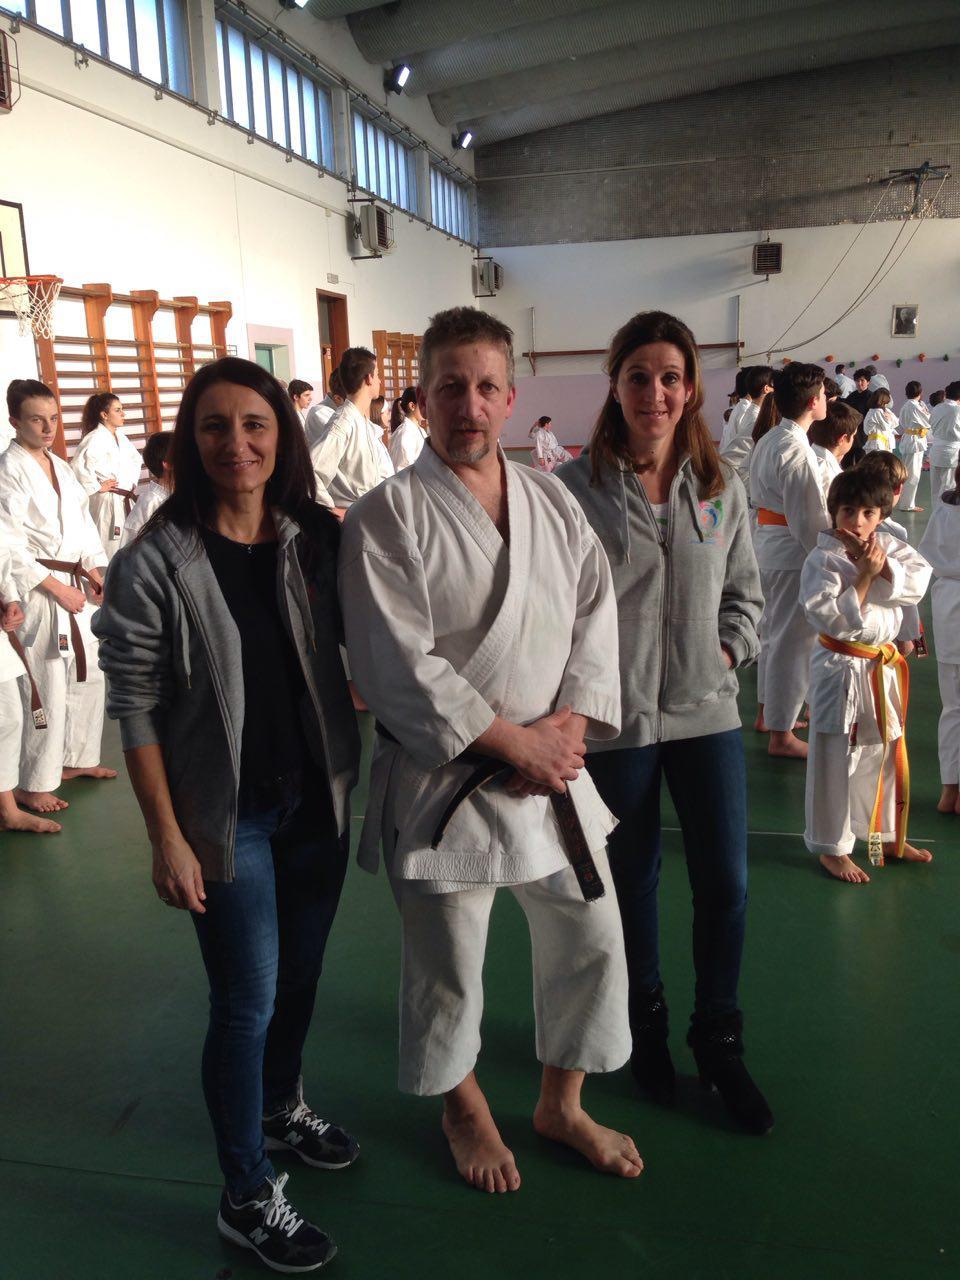 29.1.17 - saggio di karate pro FabiOnlus